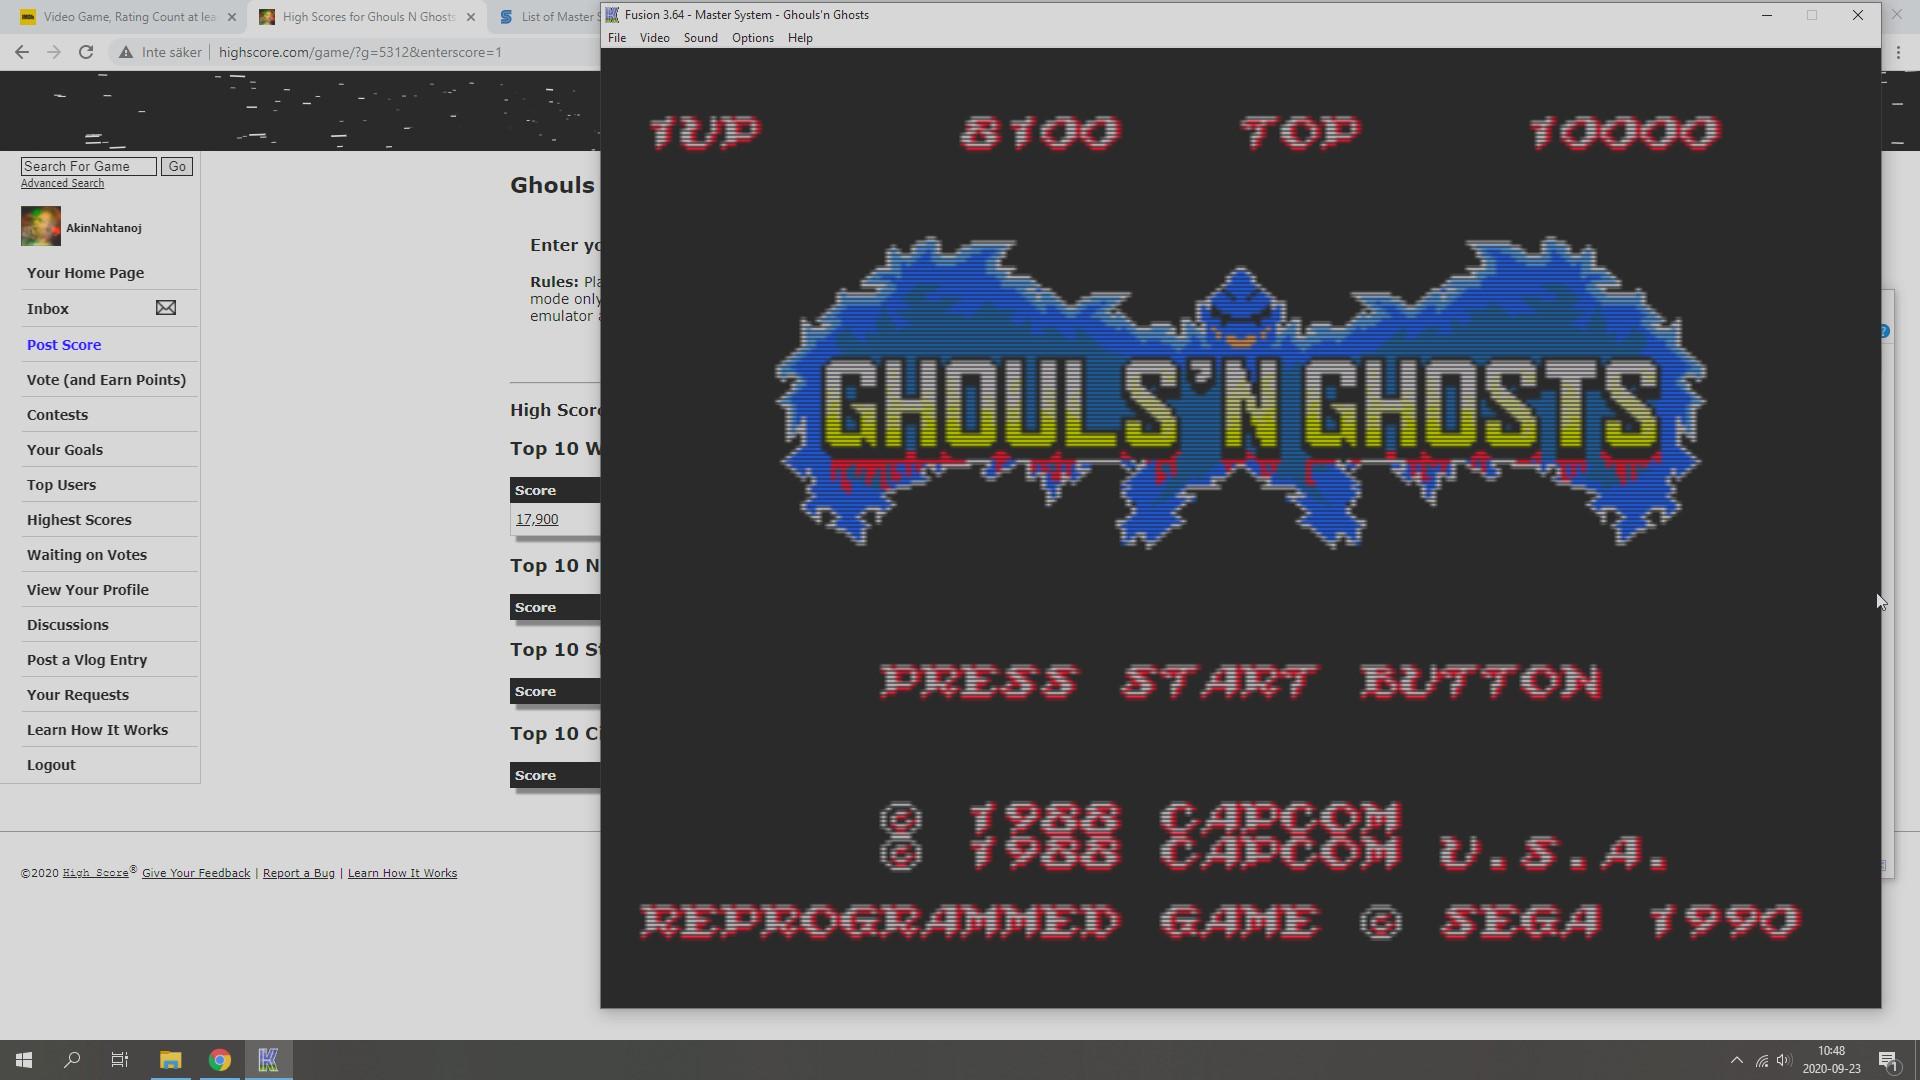 AkinNahtanoj: Ghouls N Ghosts (Sega Master System Emulated) 8,100 points on 2020-09-23 03:57:14